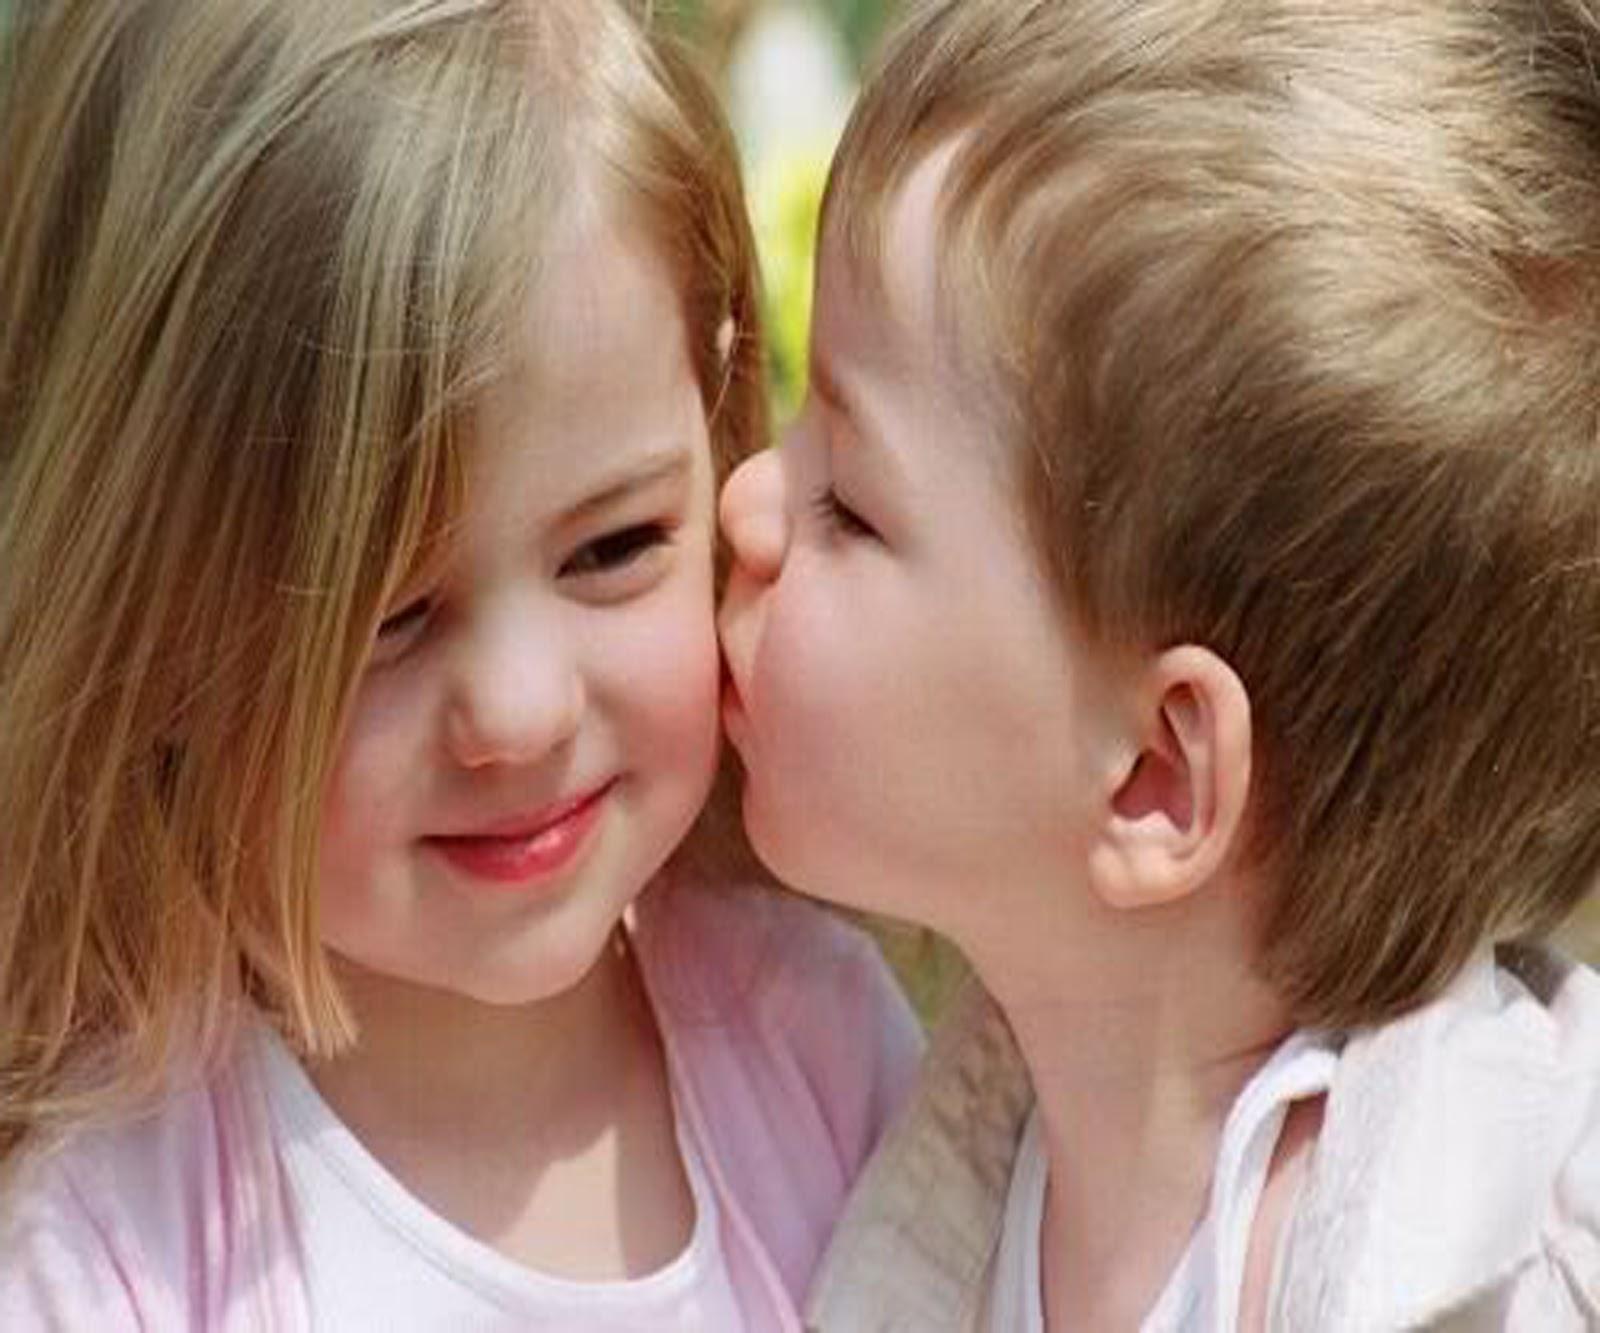 Romantic Kiss Wallpaper Free Download Hd Mount Mercy University